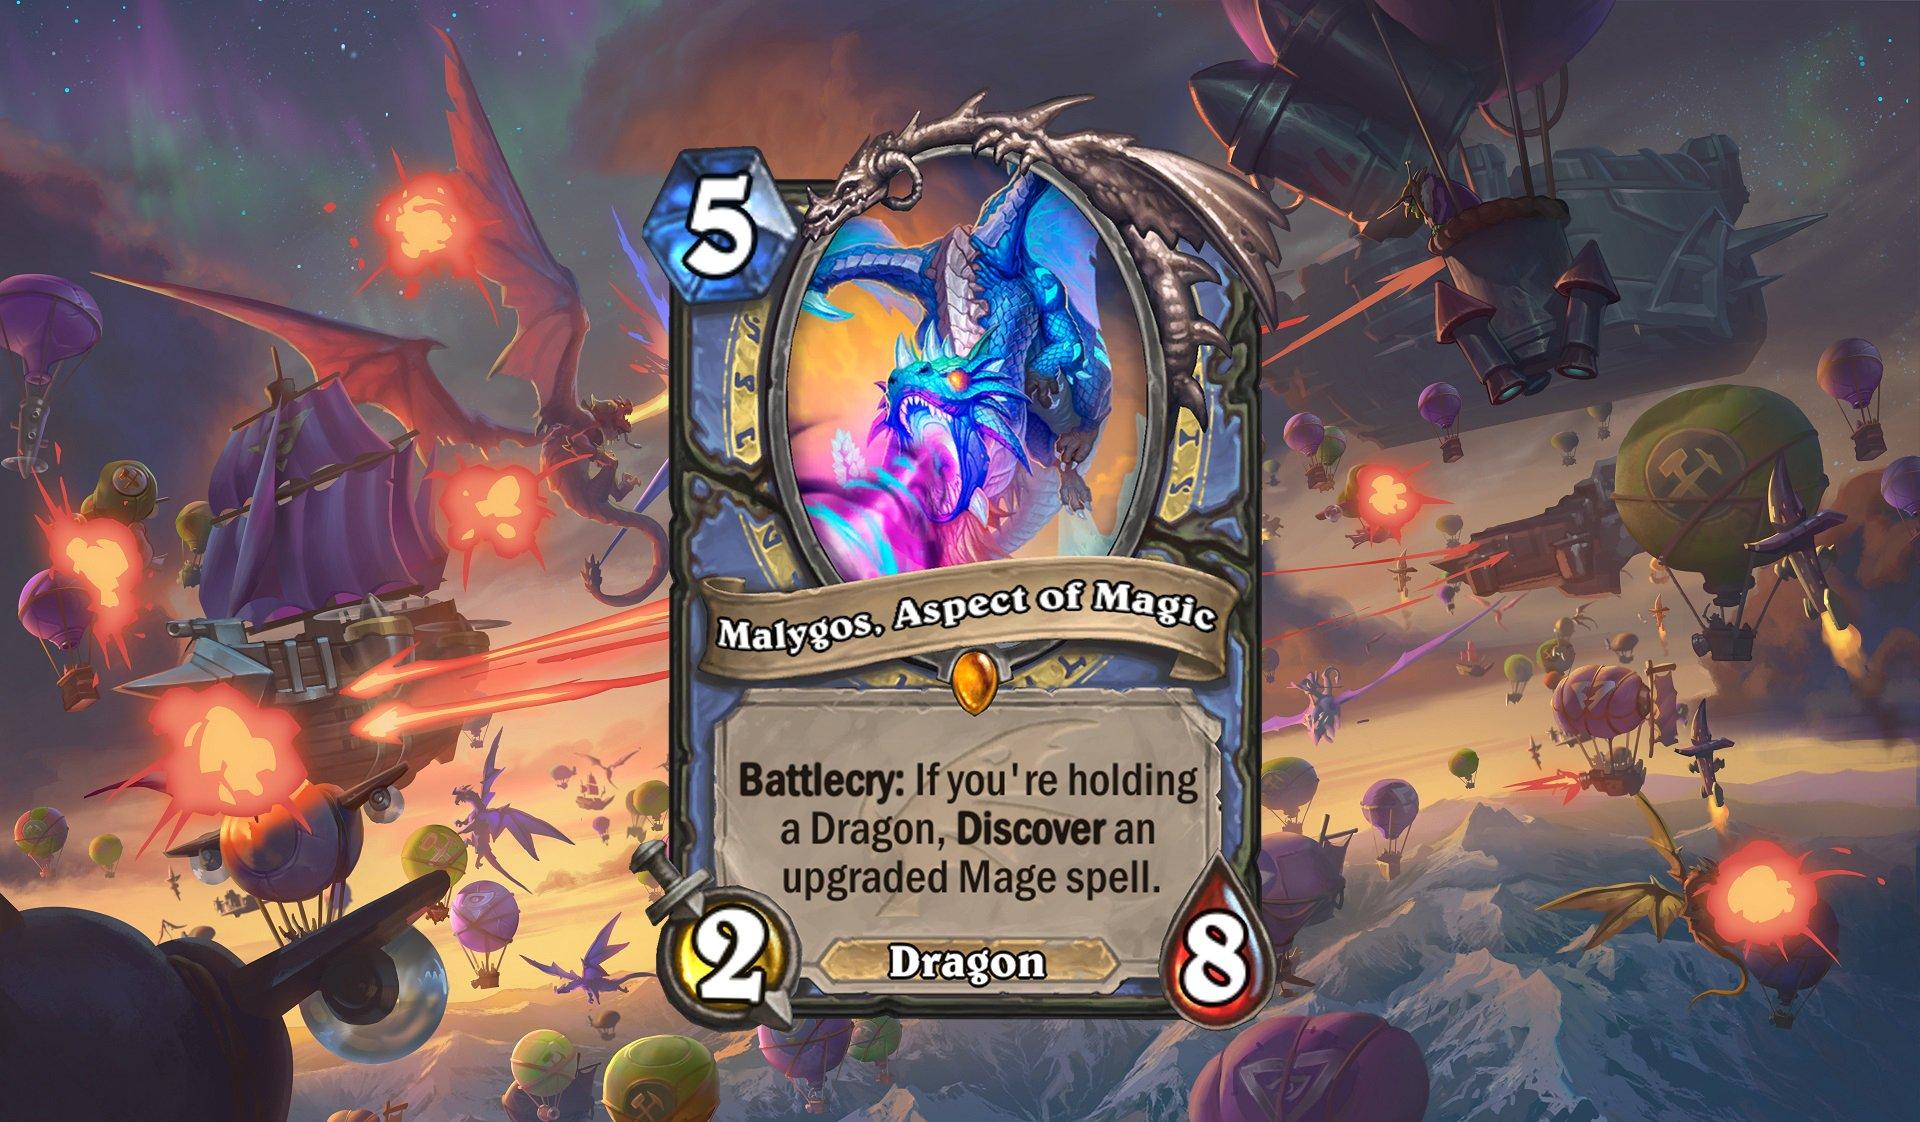 Hearthstone - Malygos Aspect of Magic